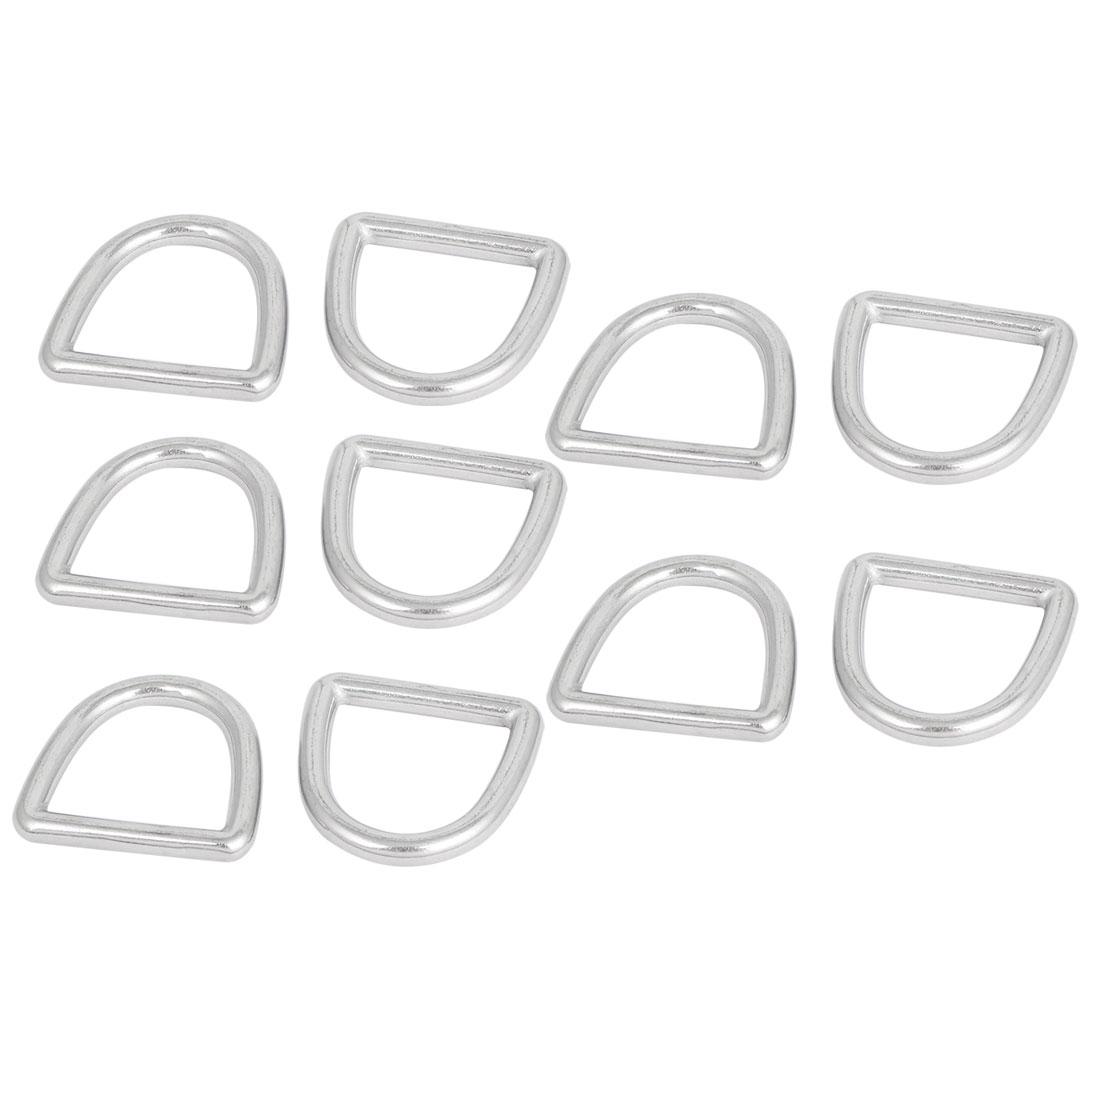 Stainless Steel D Ring Hooks D-Shaped Buckles Bag Handbag Belt Buckle 10 Pcs